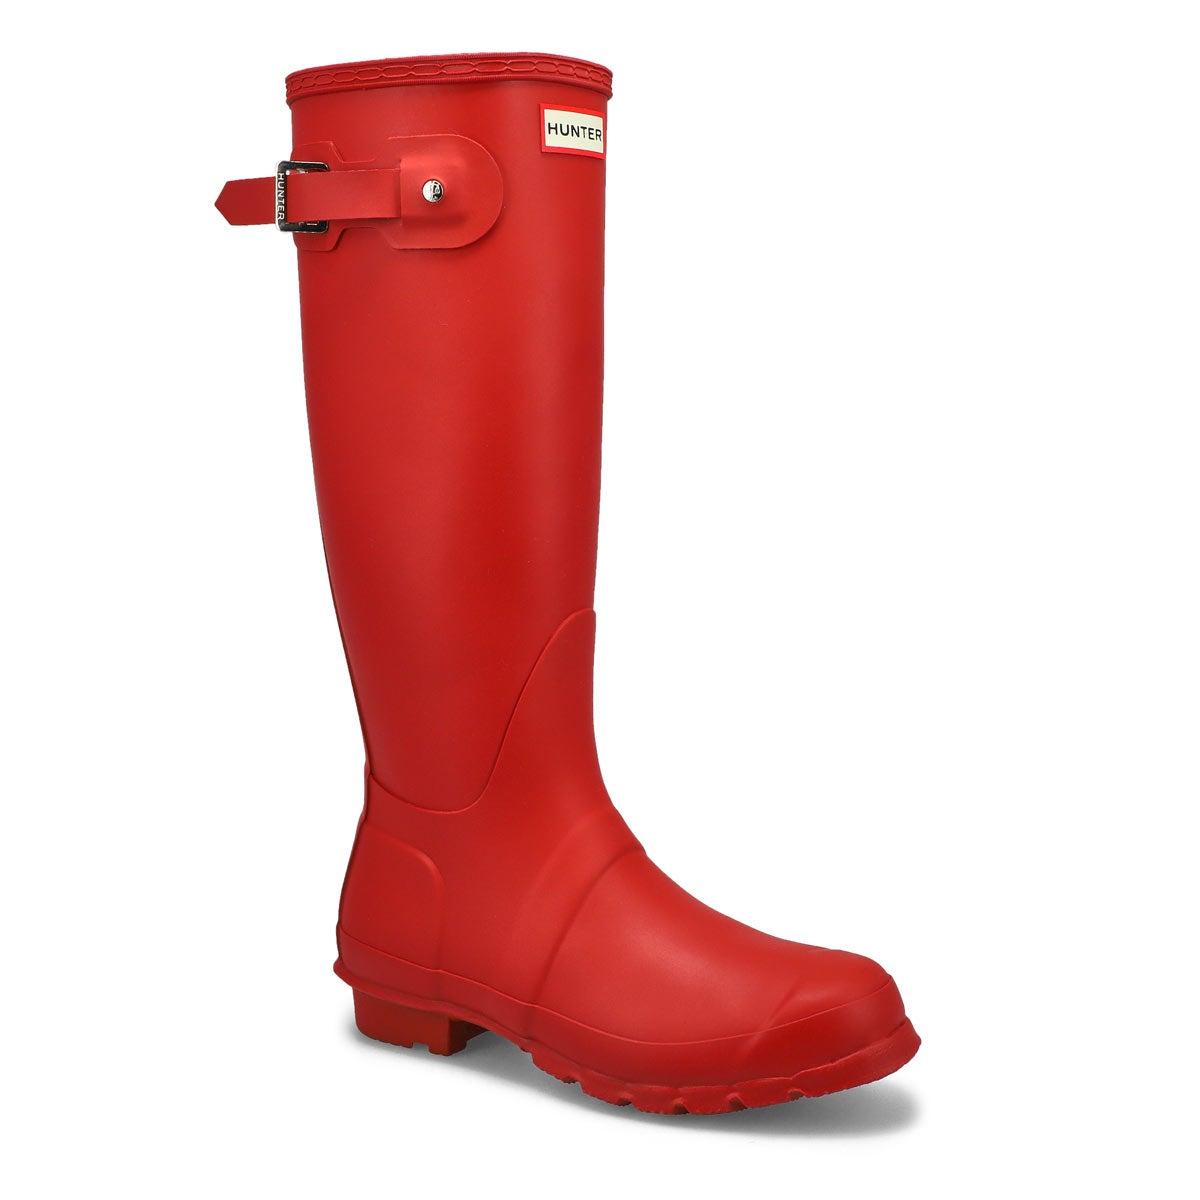 Women's ORIGINAL TALL CLASSIC red rain boots